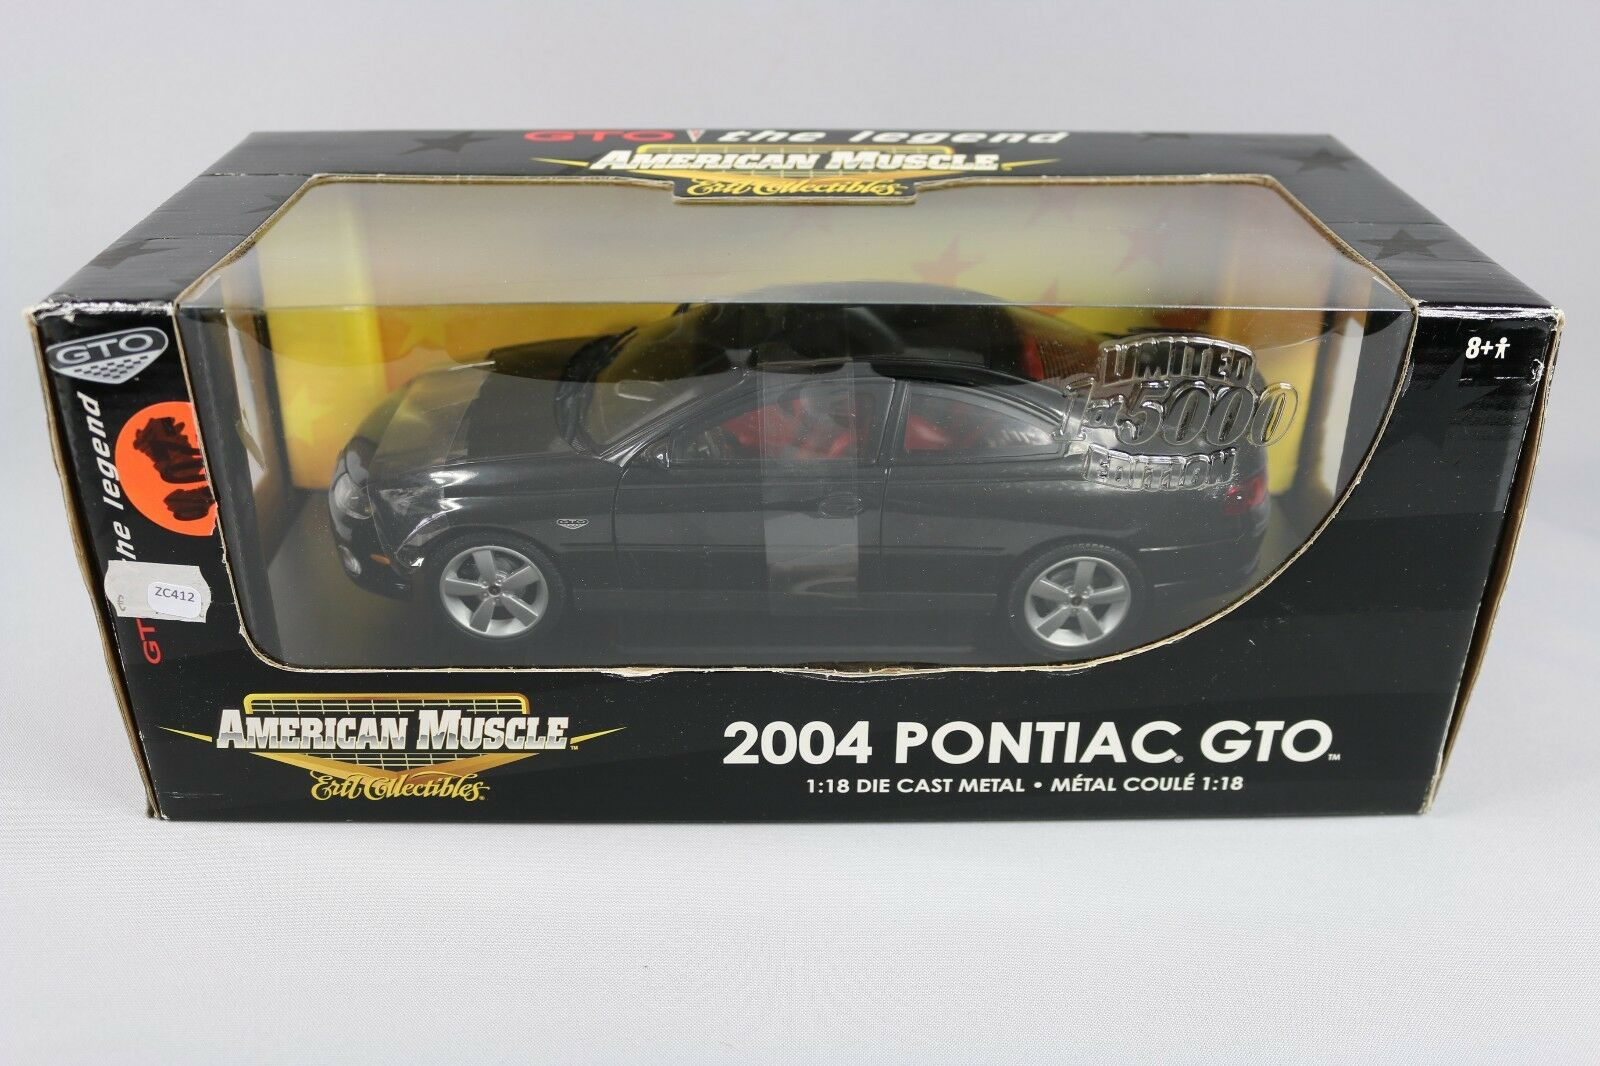 ZC412 Ertl RC2 36678 Voiture Miniature 1 18 Pontiac Gto 2004 American Muscle